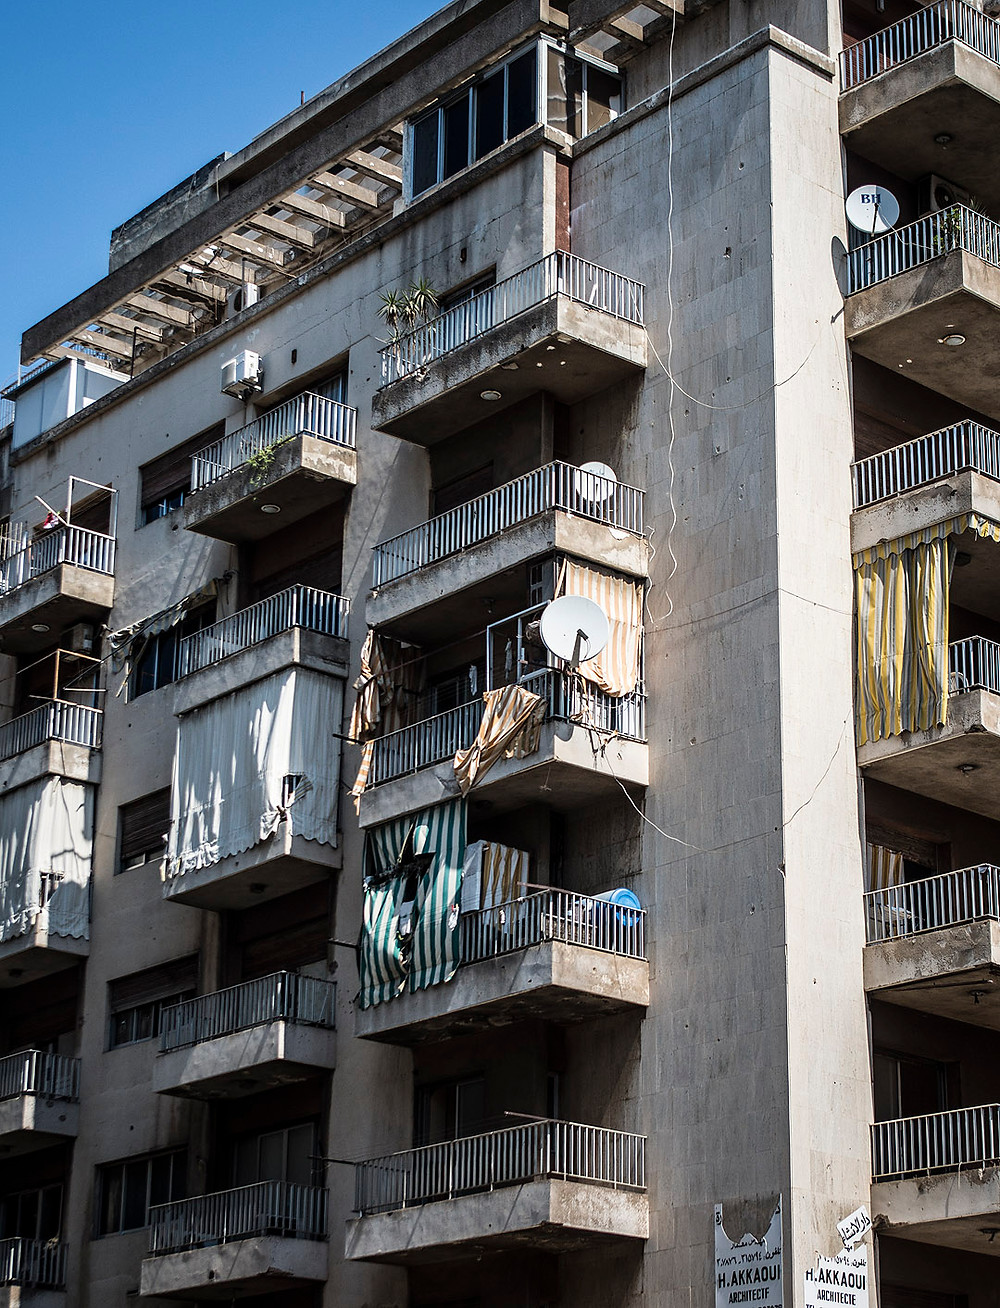 Apartment block in Beirut